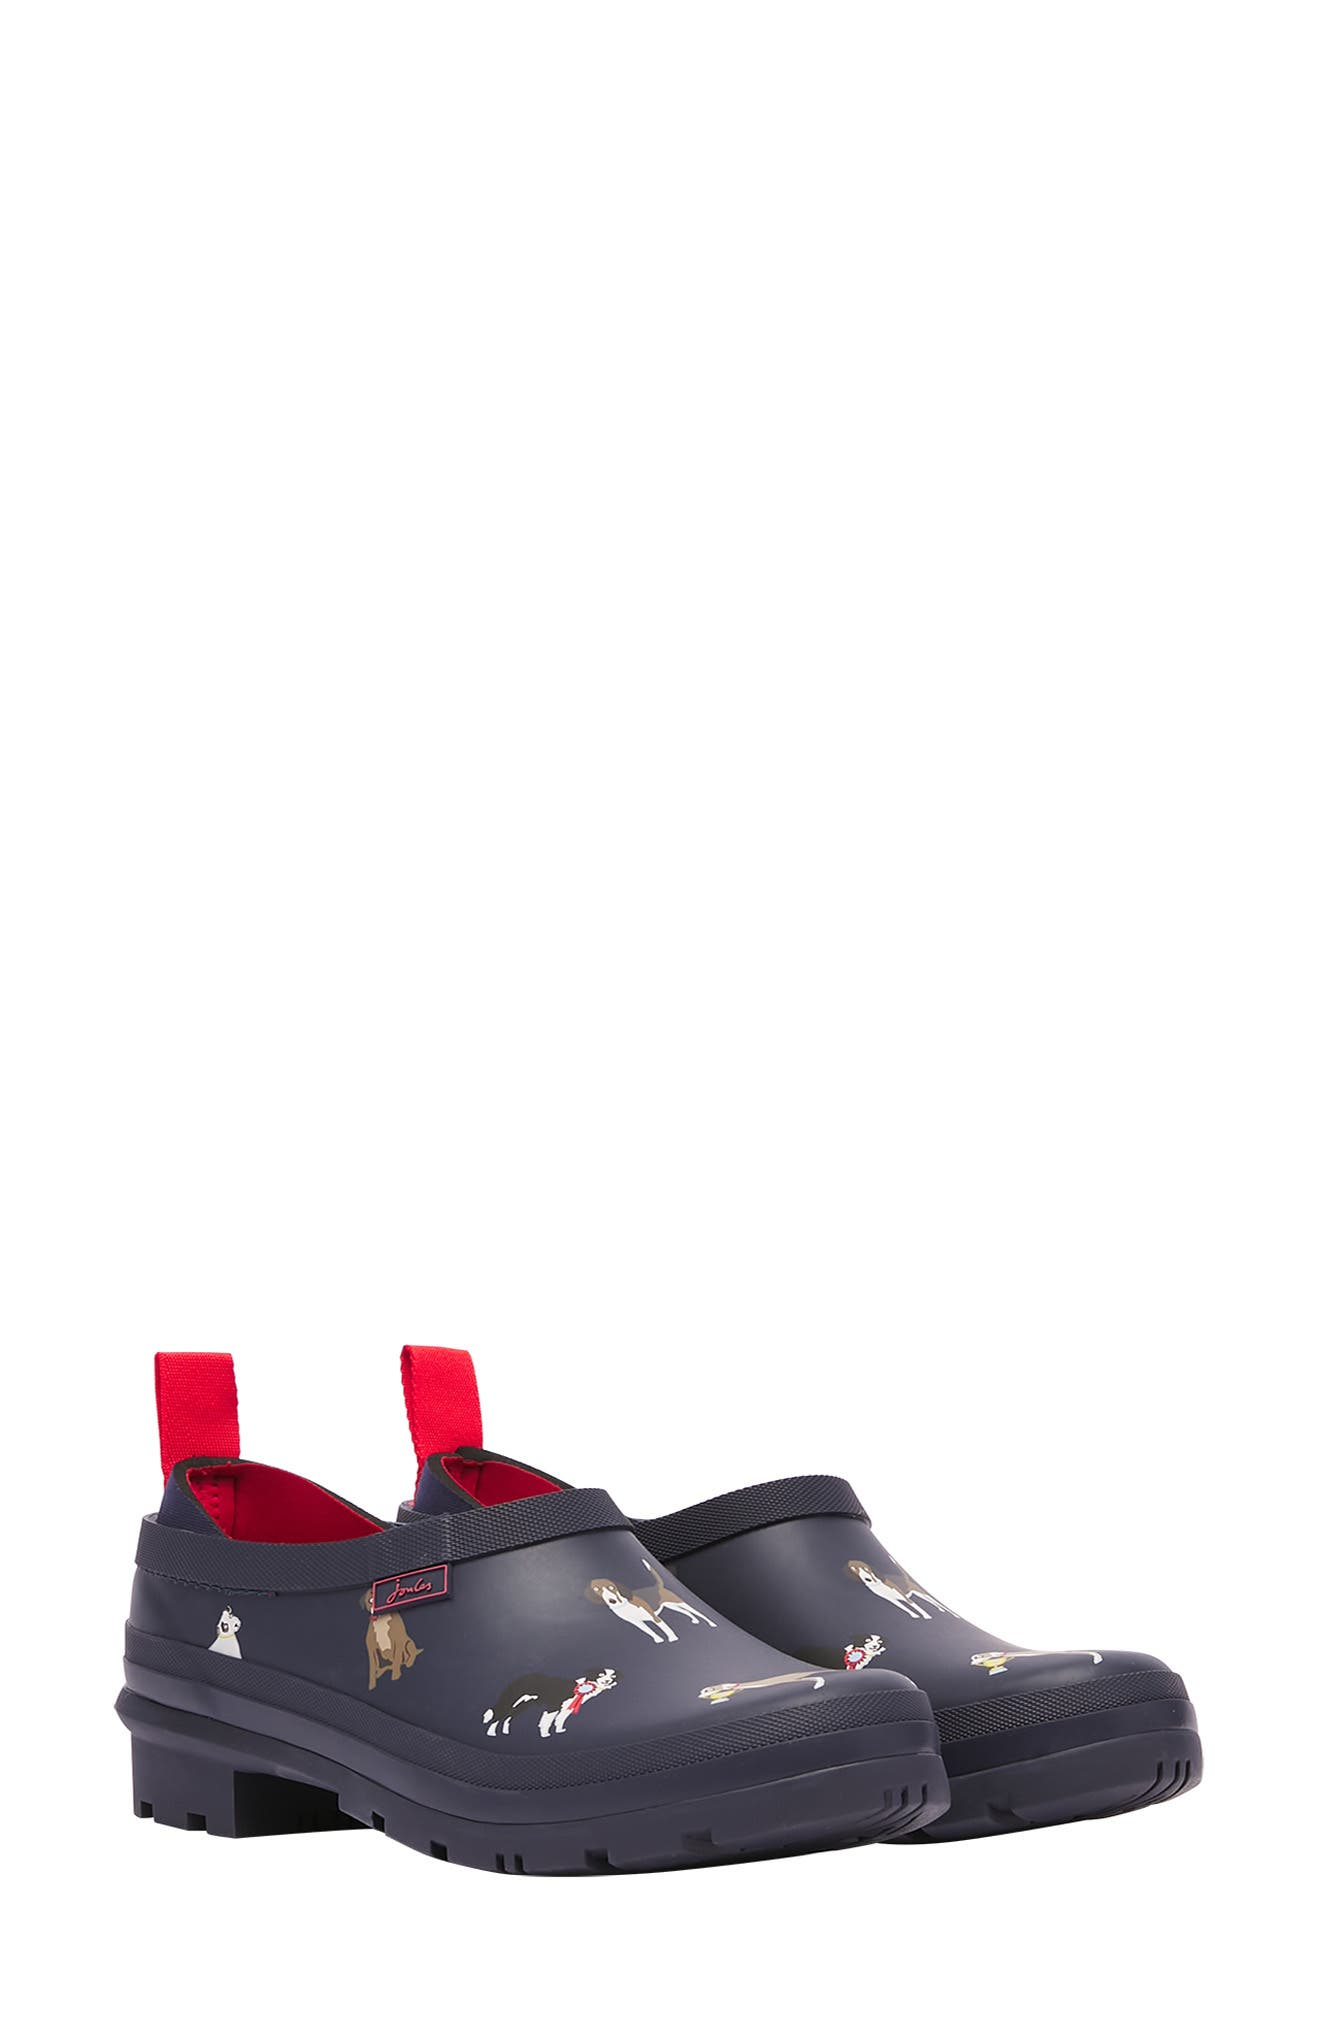 Pop On Waterproof Rain Boot Clog